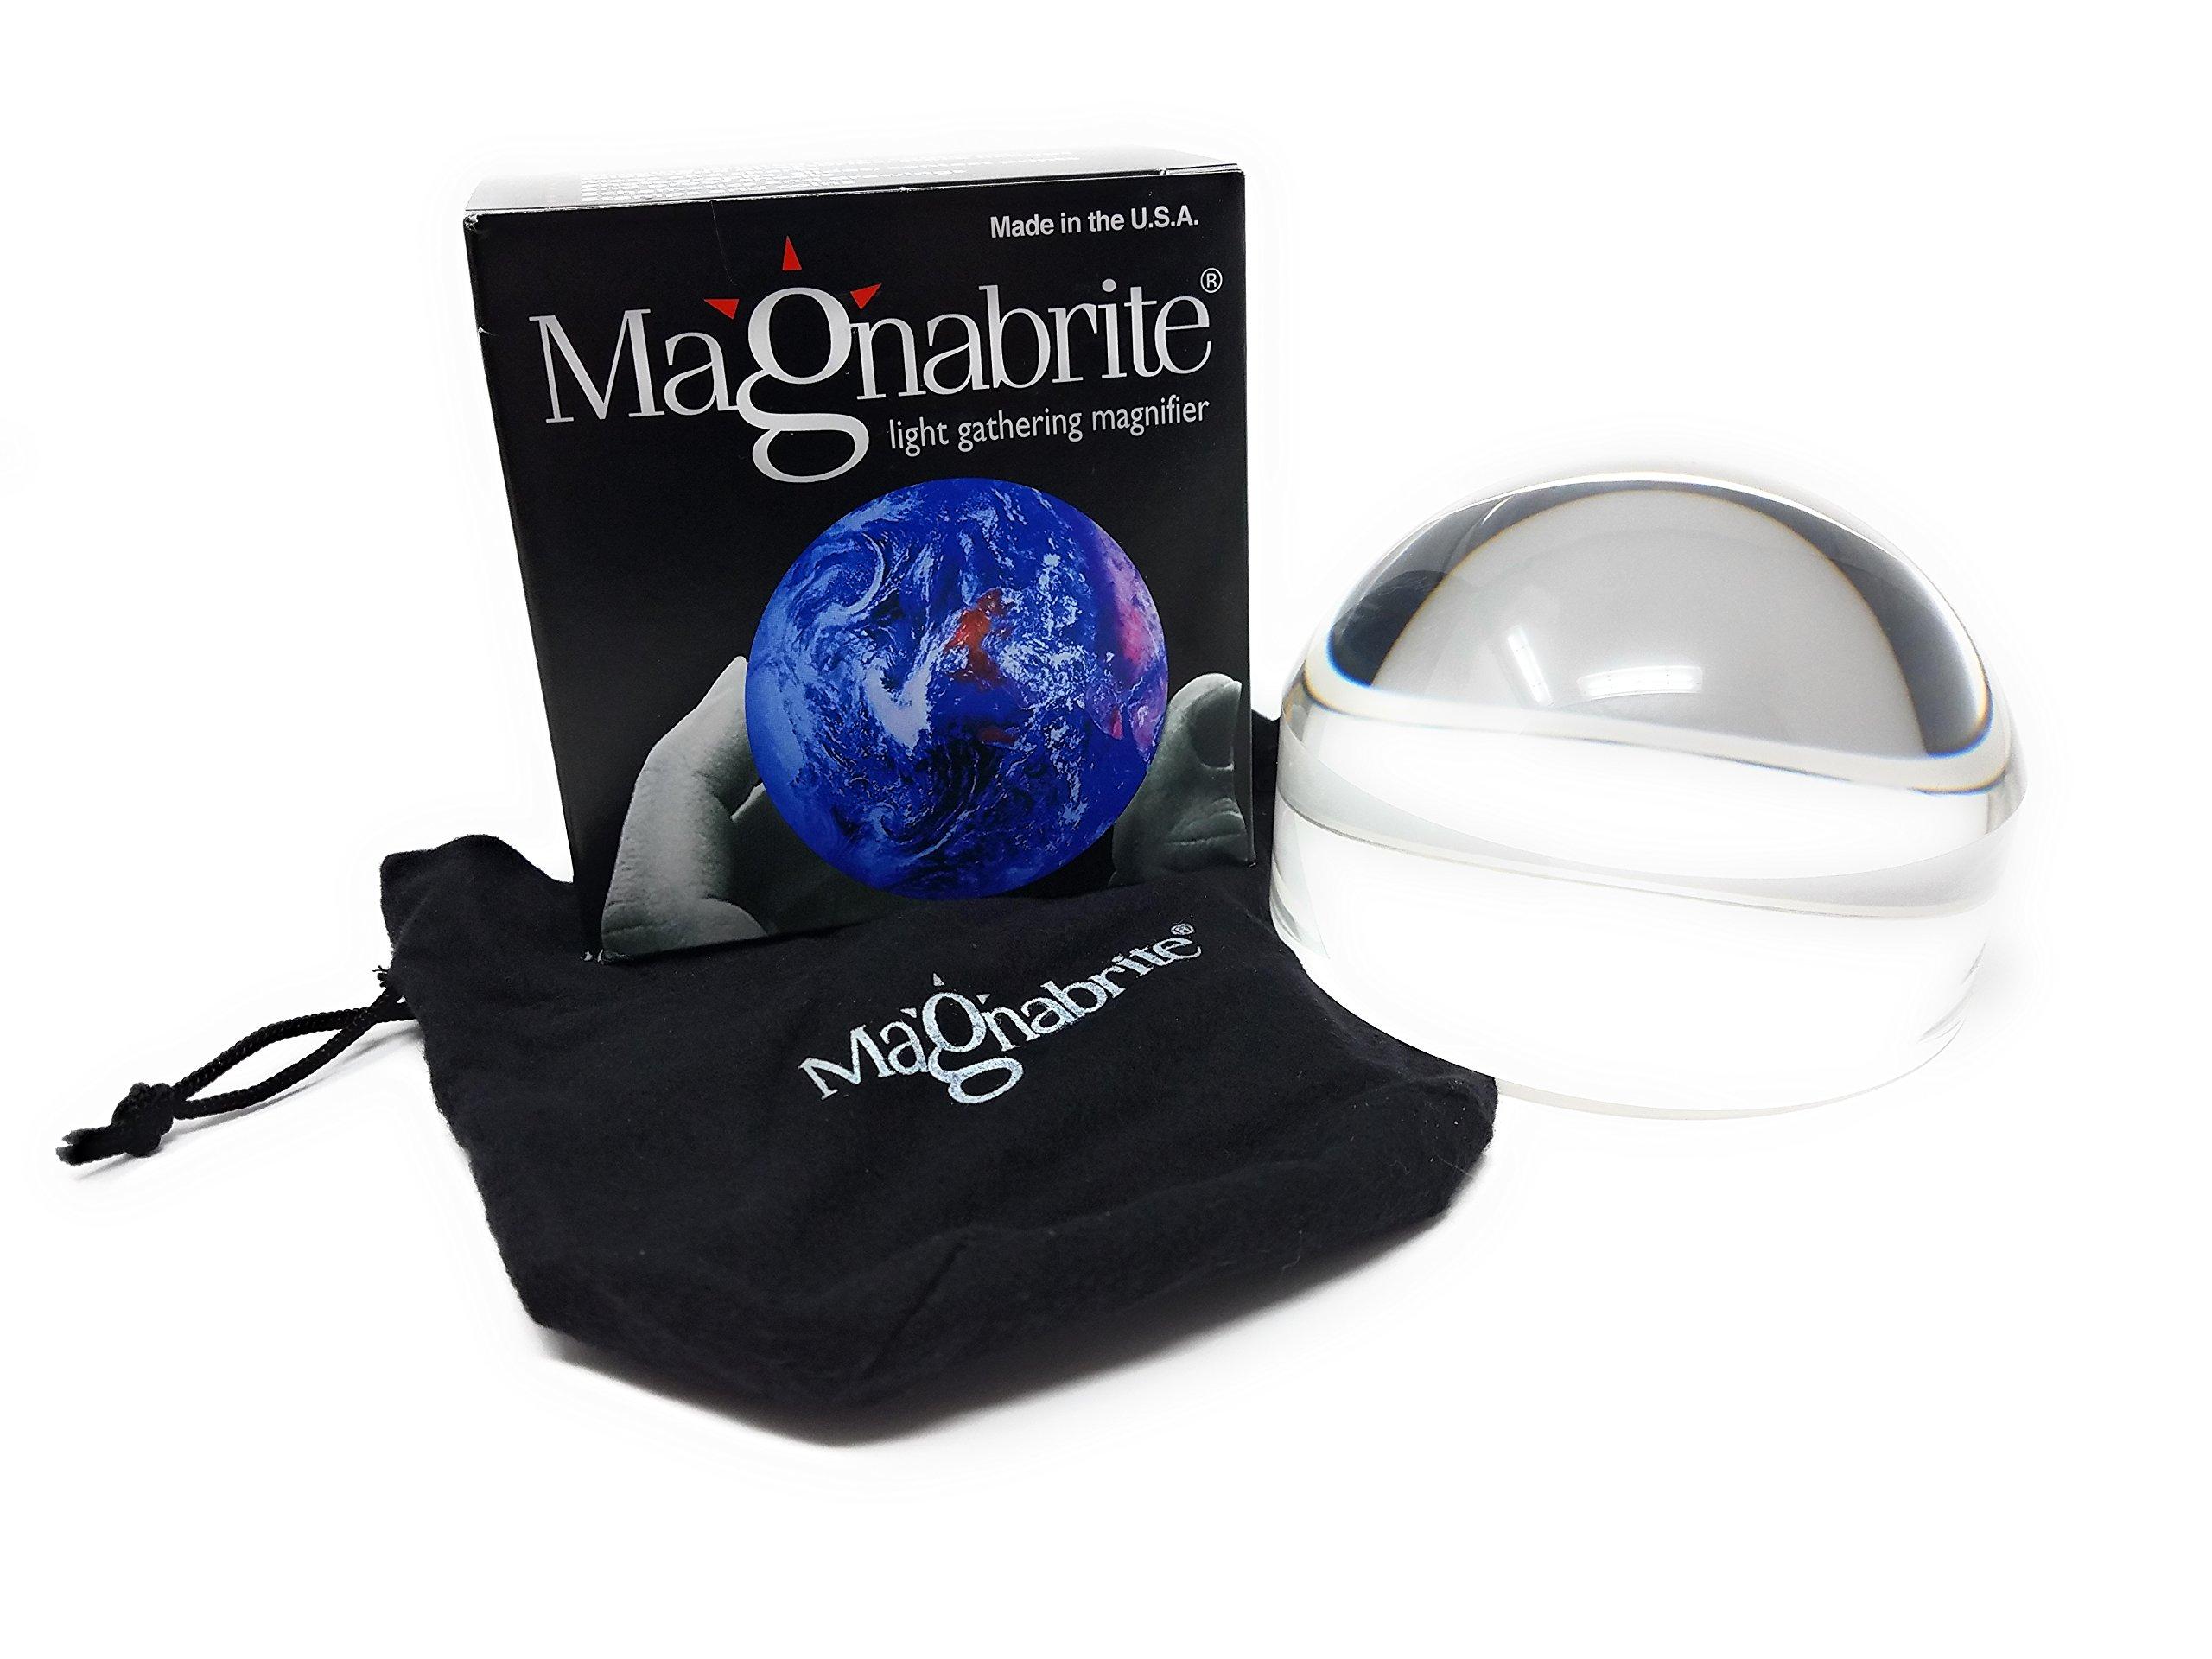 4X Magnabrite Bright Field Dome Magnifier 4.5 Inches